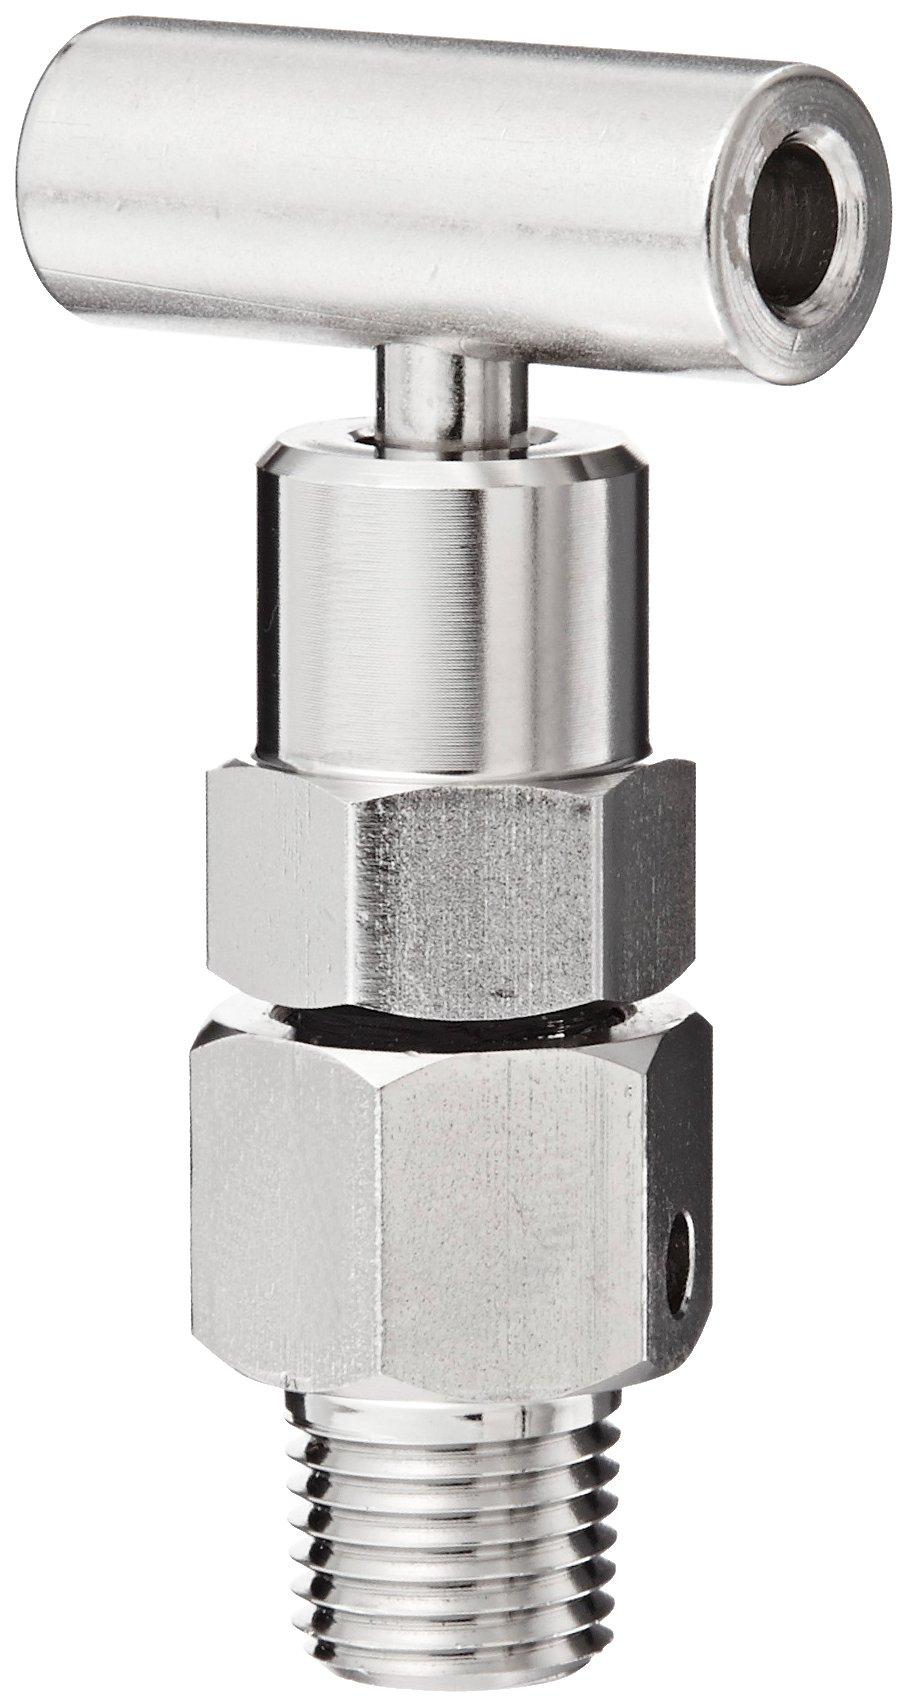 NOSHOK 800 Series Zinc-Nickel Plated Steel Bleed Hard Seat Needle Valve, 1/4'' NPT Male, 10000 psi Pressure Range